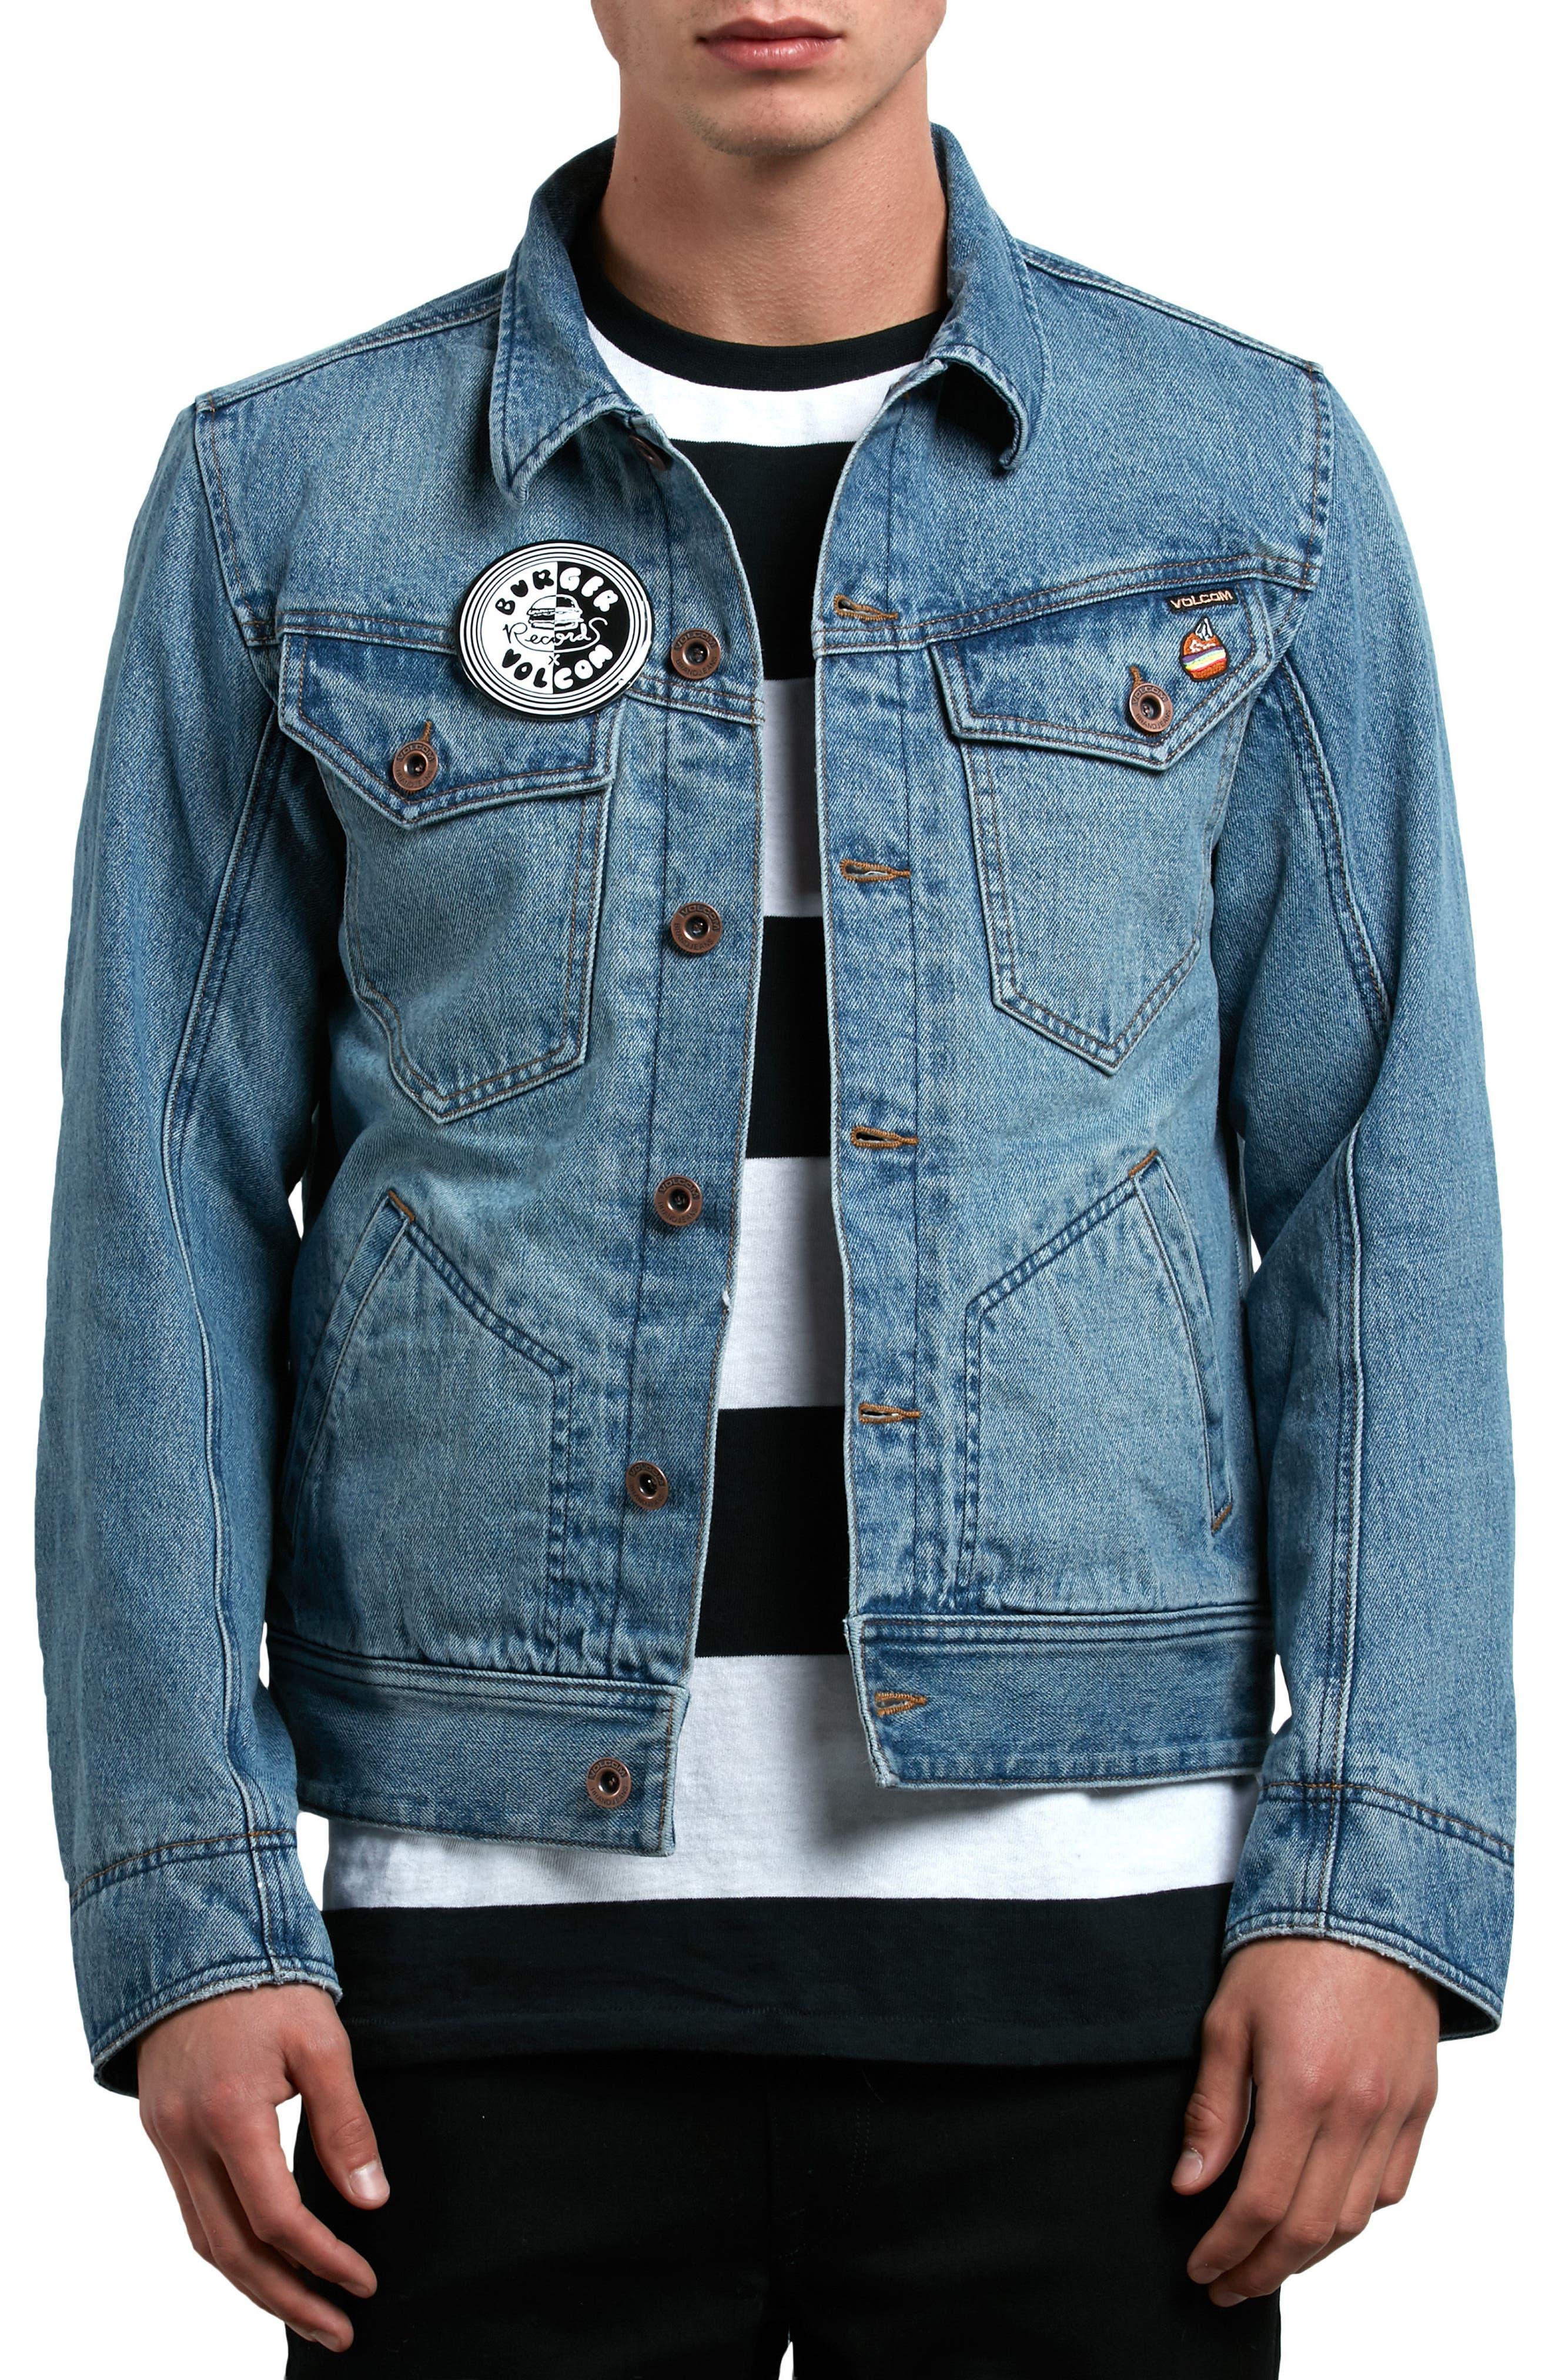 Volcom x Burger Records Denim Jacket